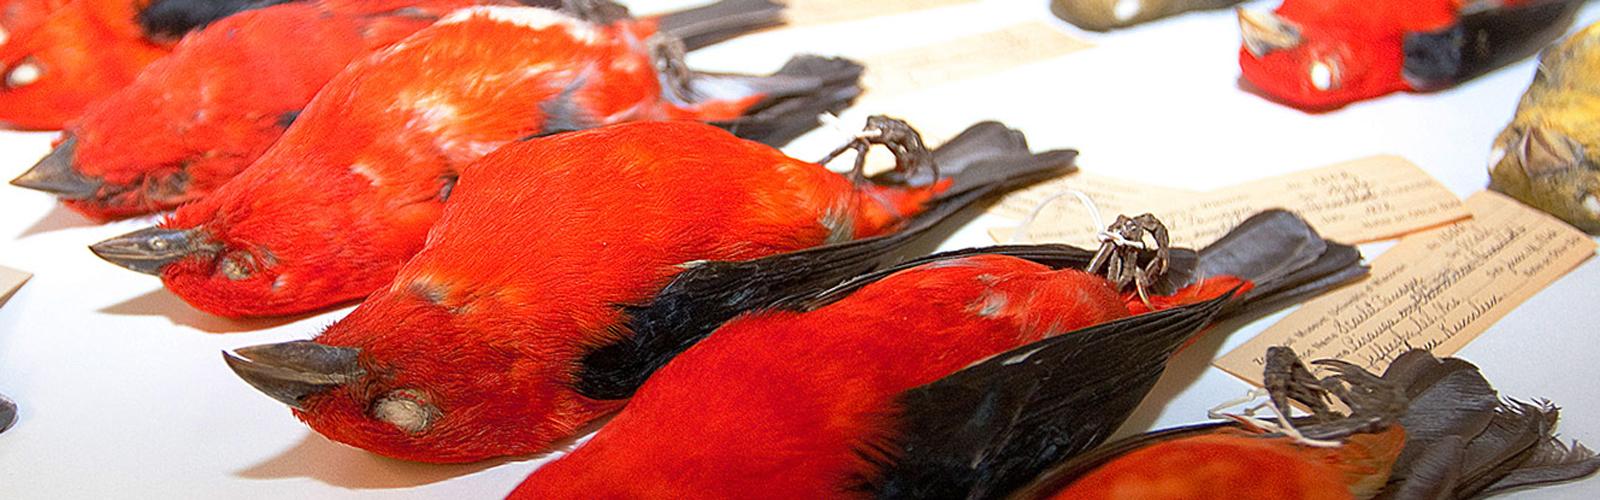 red bird specimens